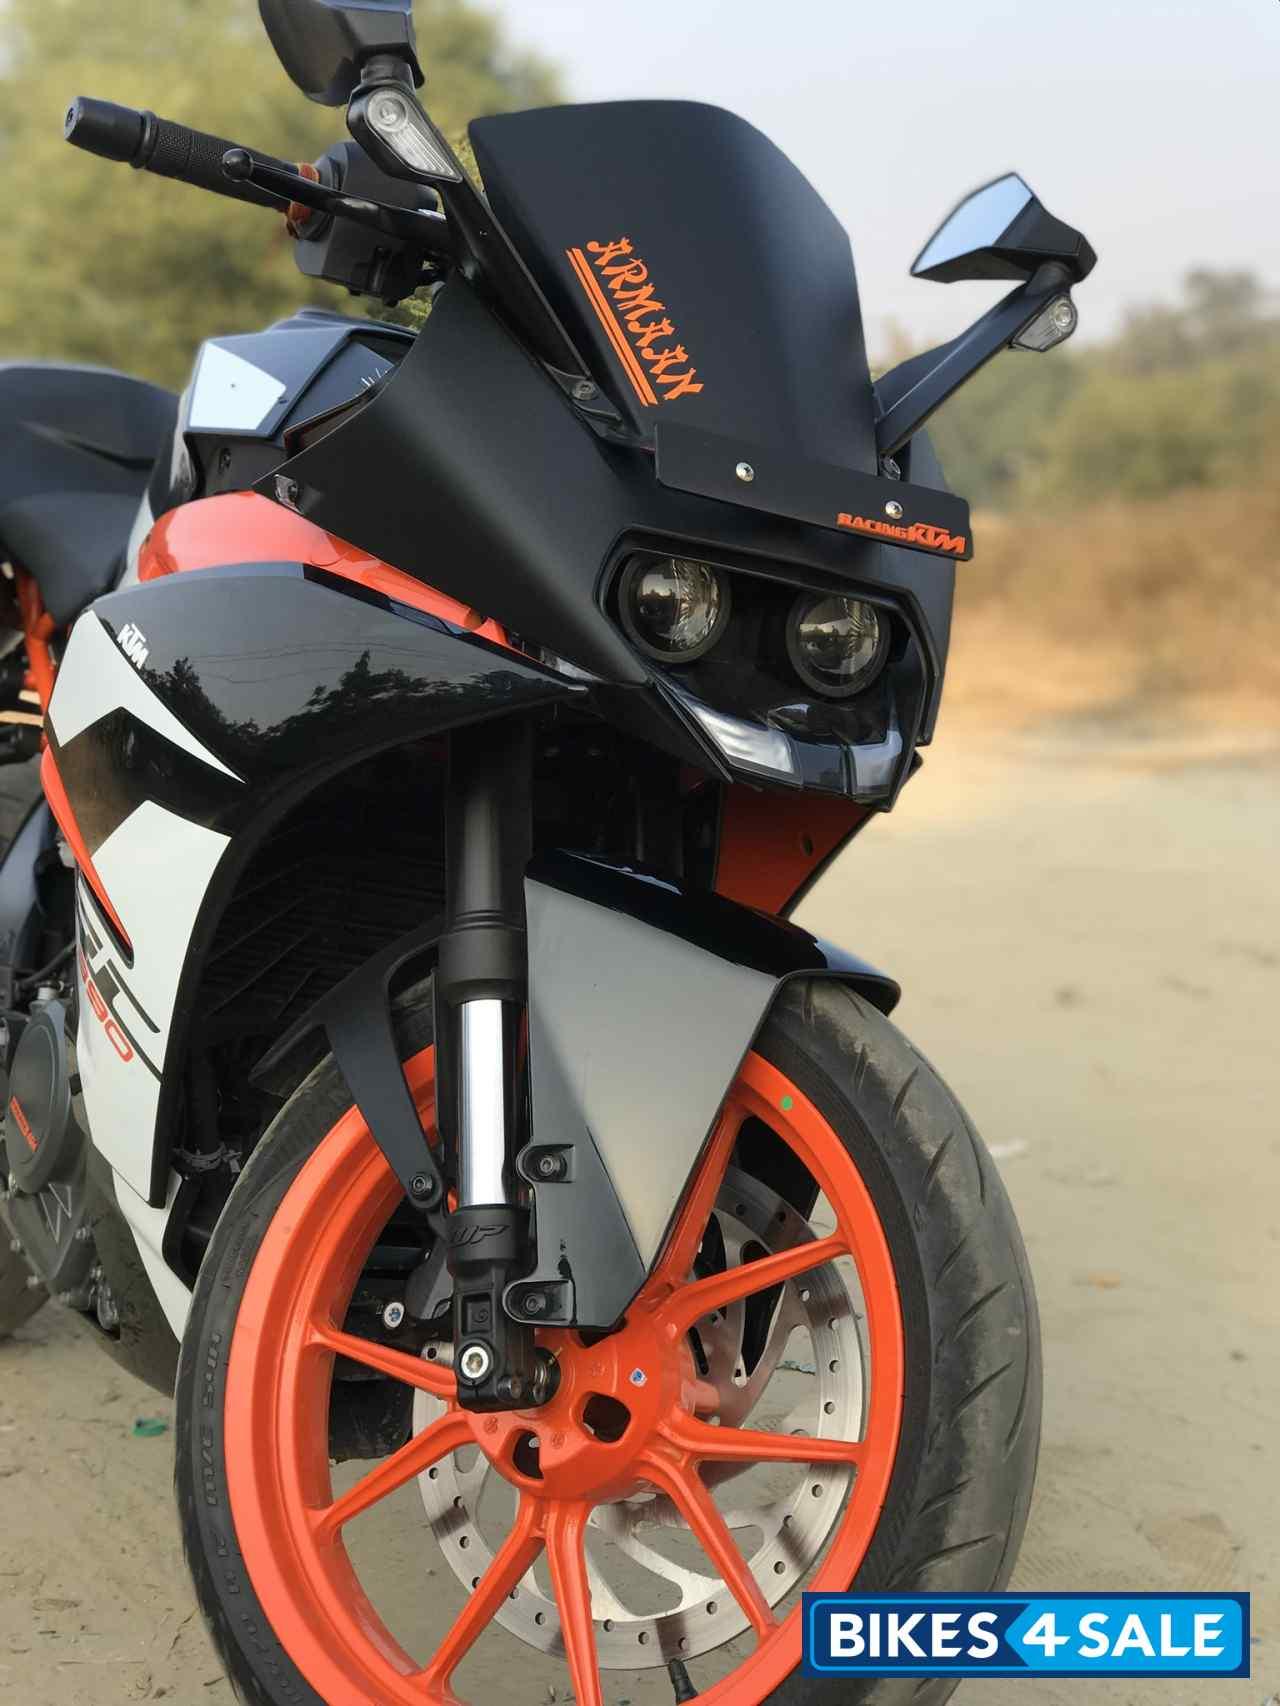 Used 2017 Model Ktm Rc 390 For Sale In Meerut Id 261334 Bikes4sale